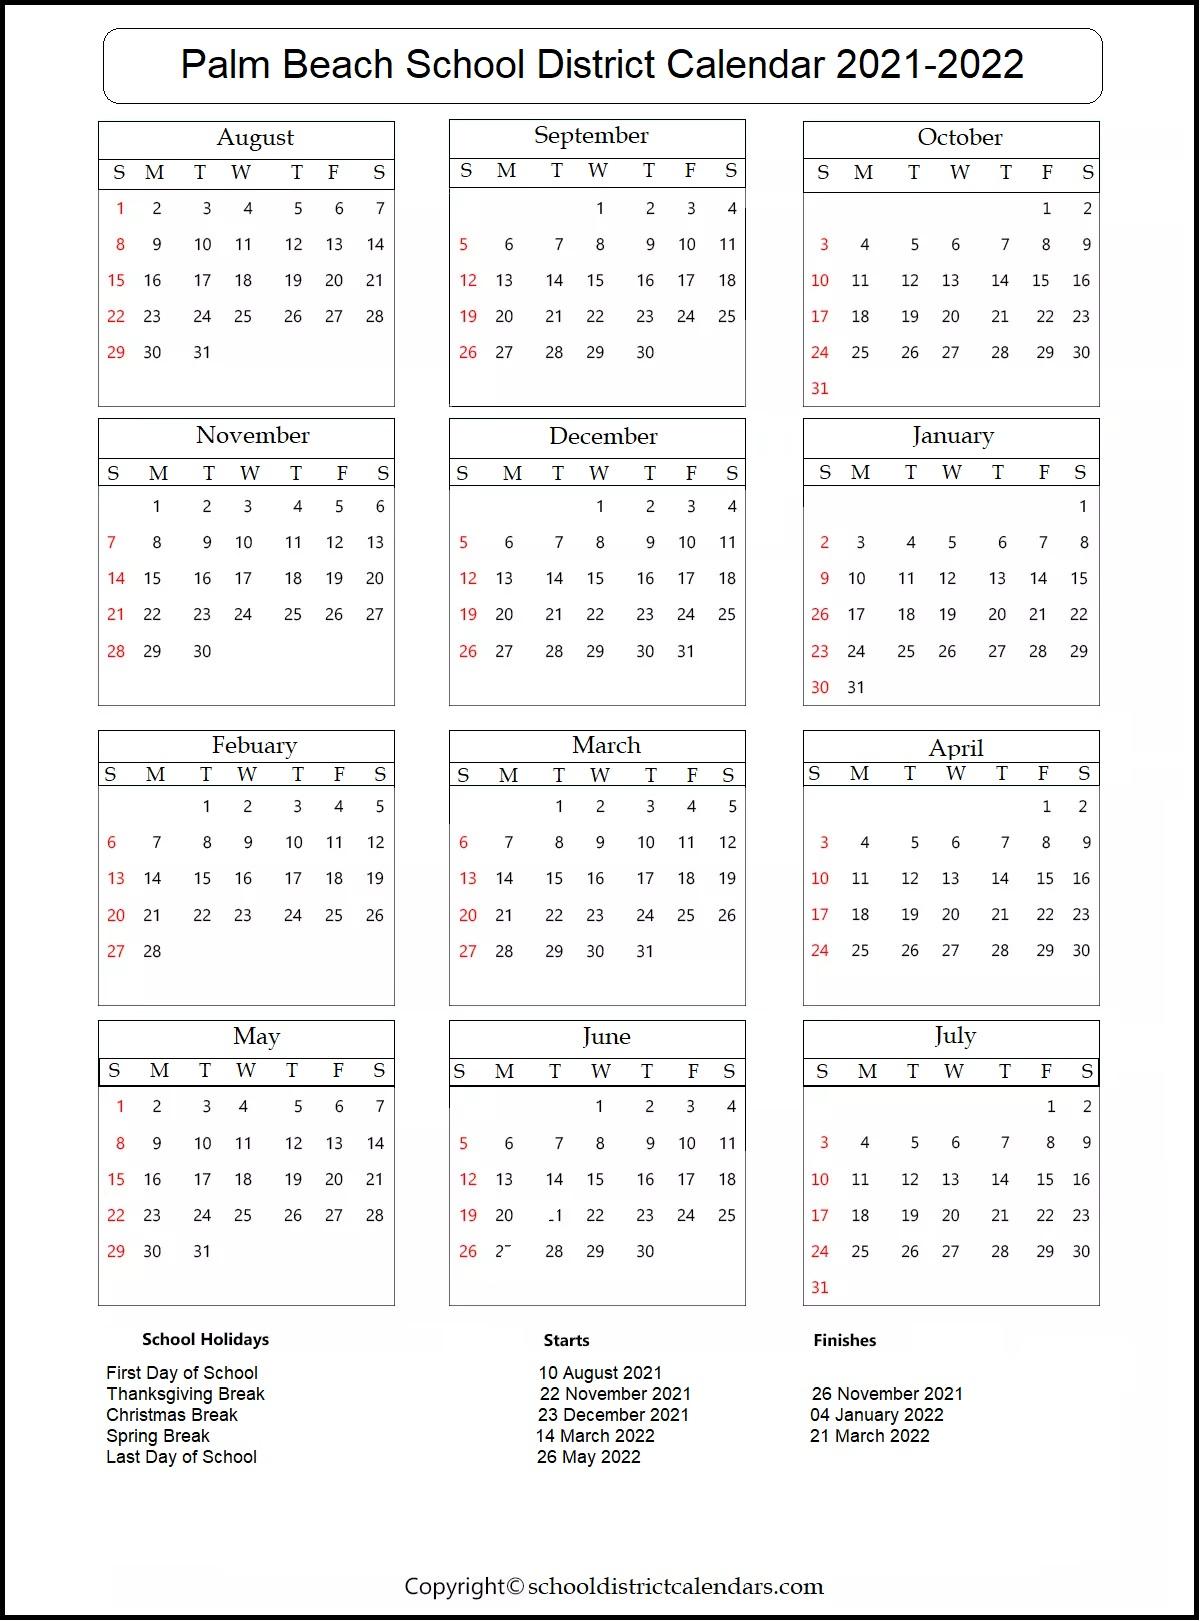 Palm Beach School District Calendar 2021-2022